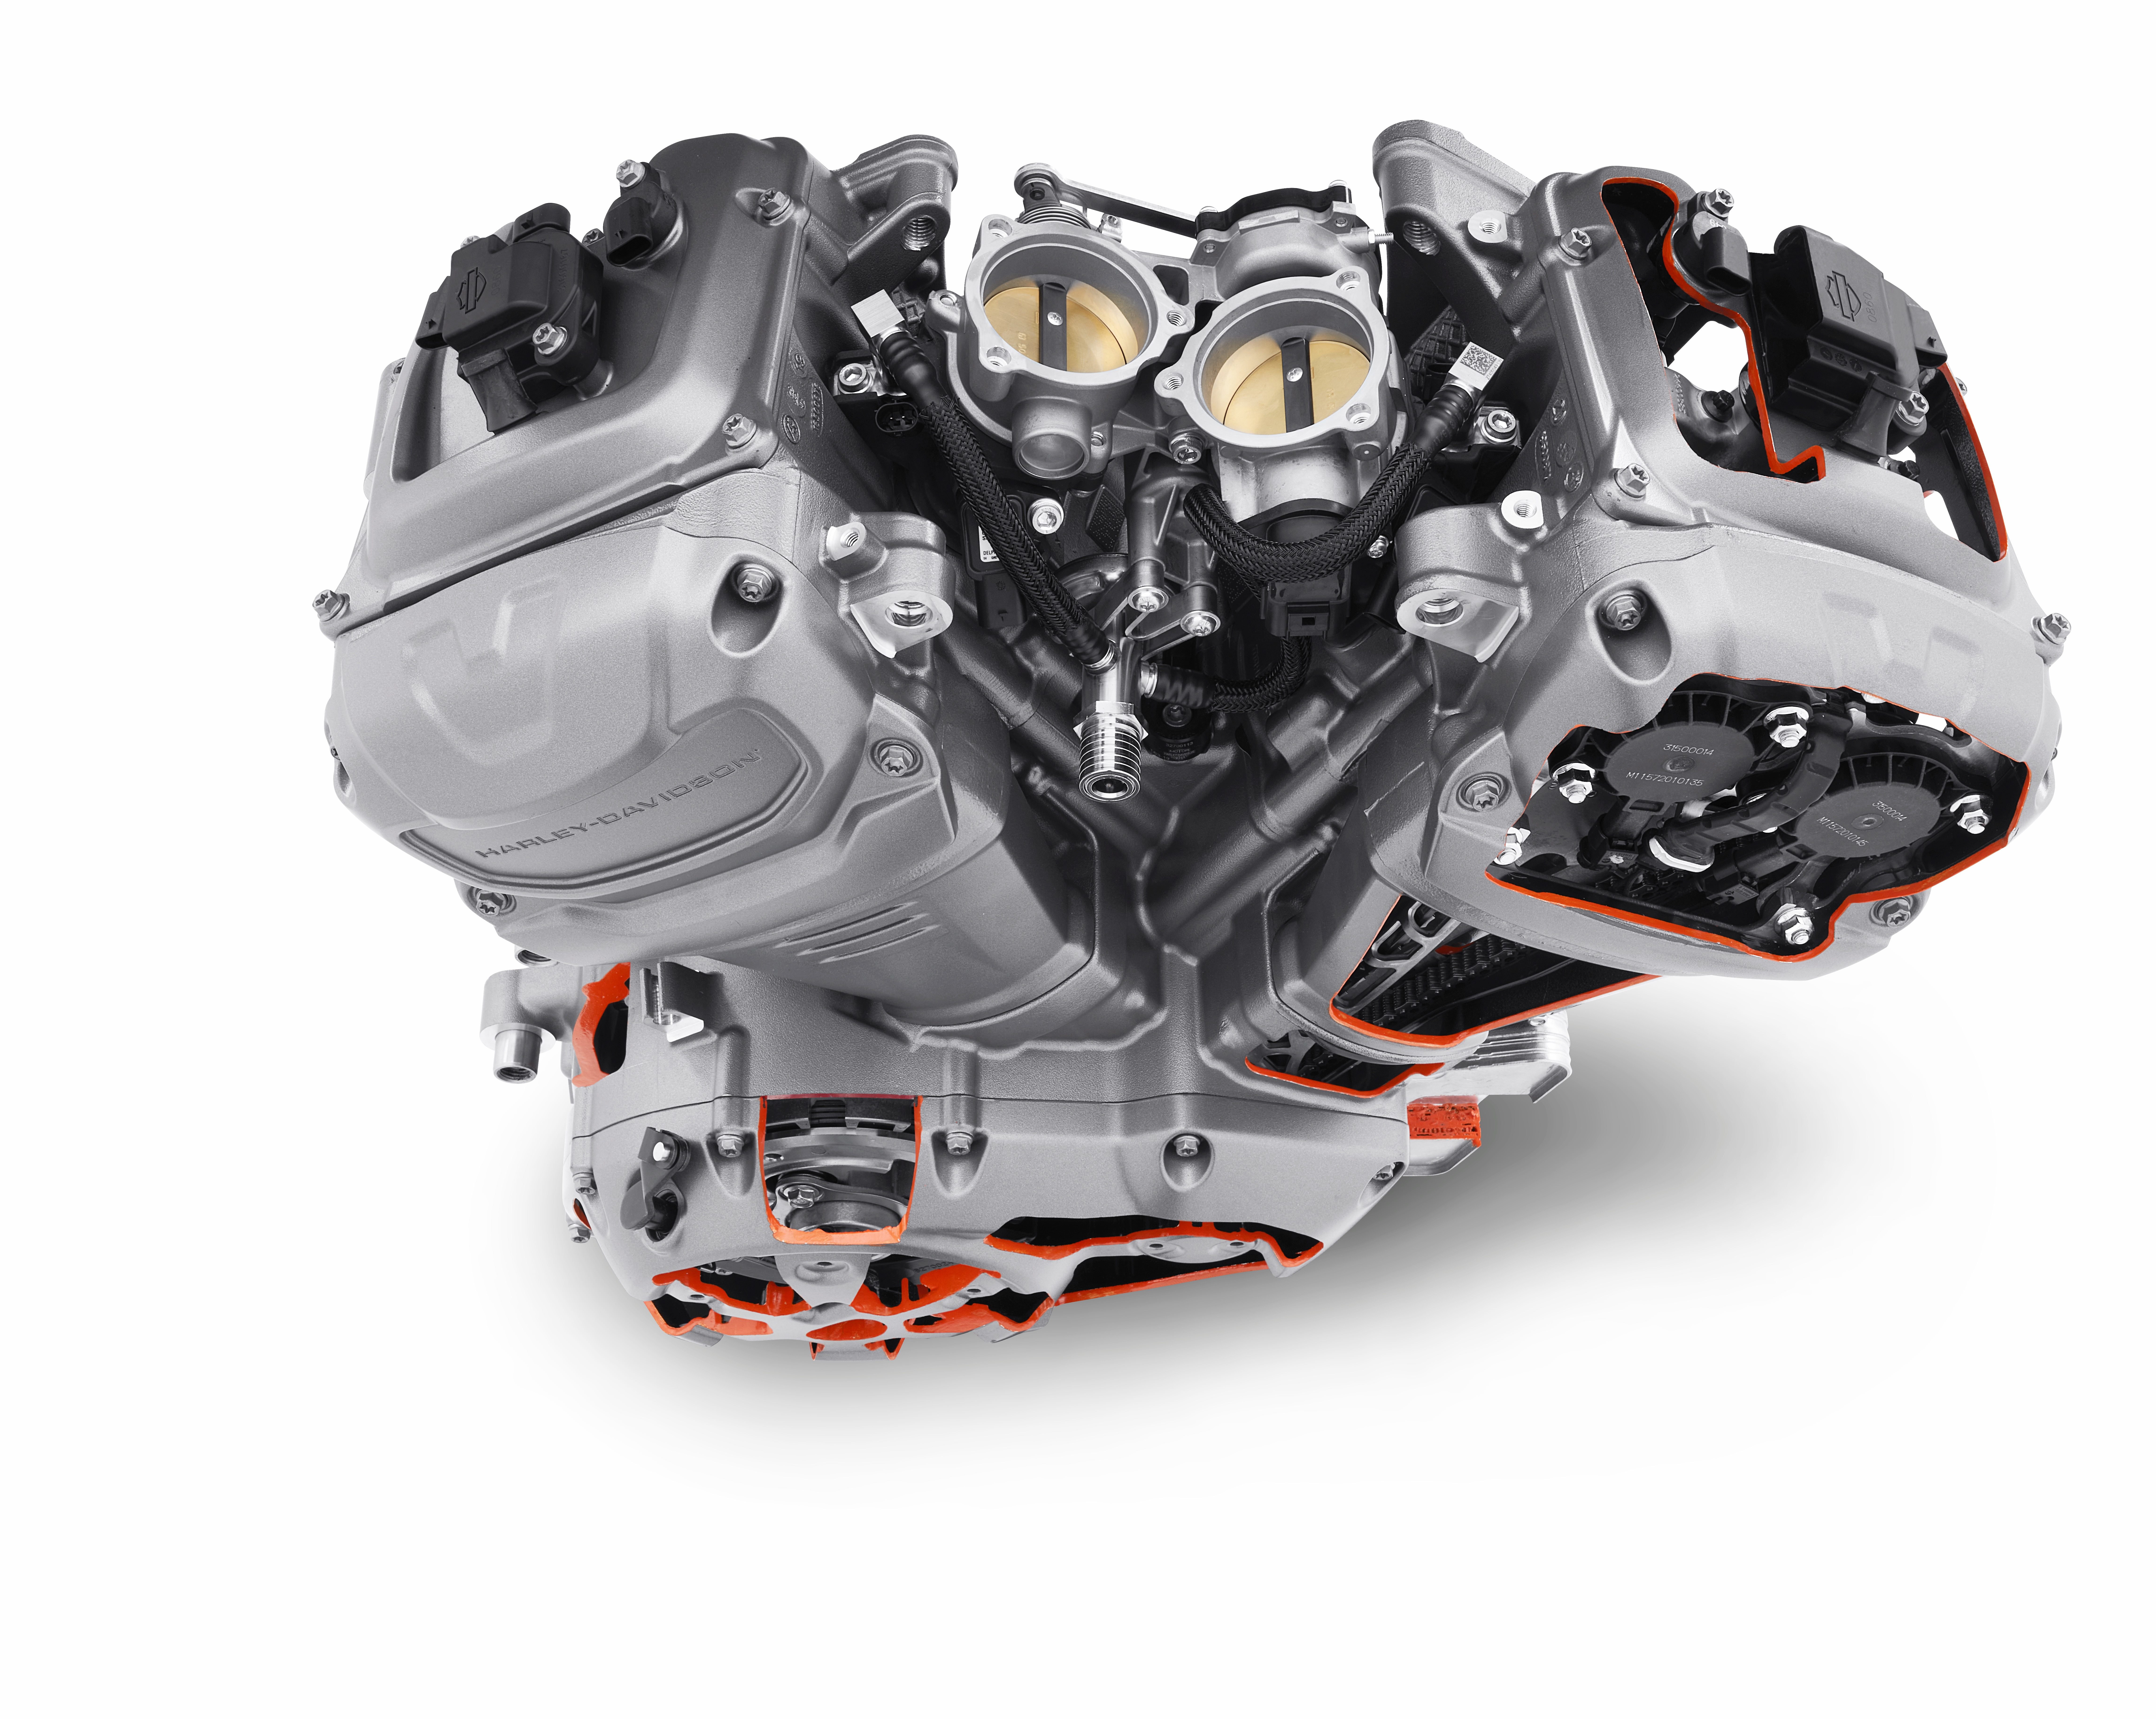 Harley-Davidson Pan America engine